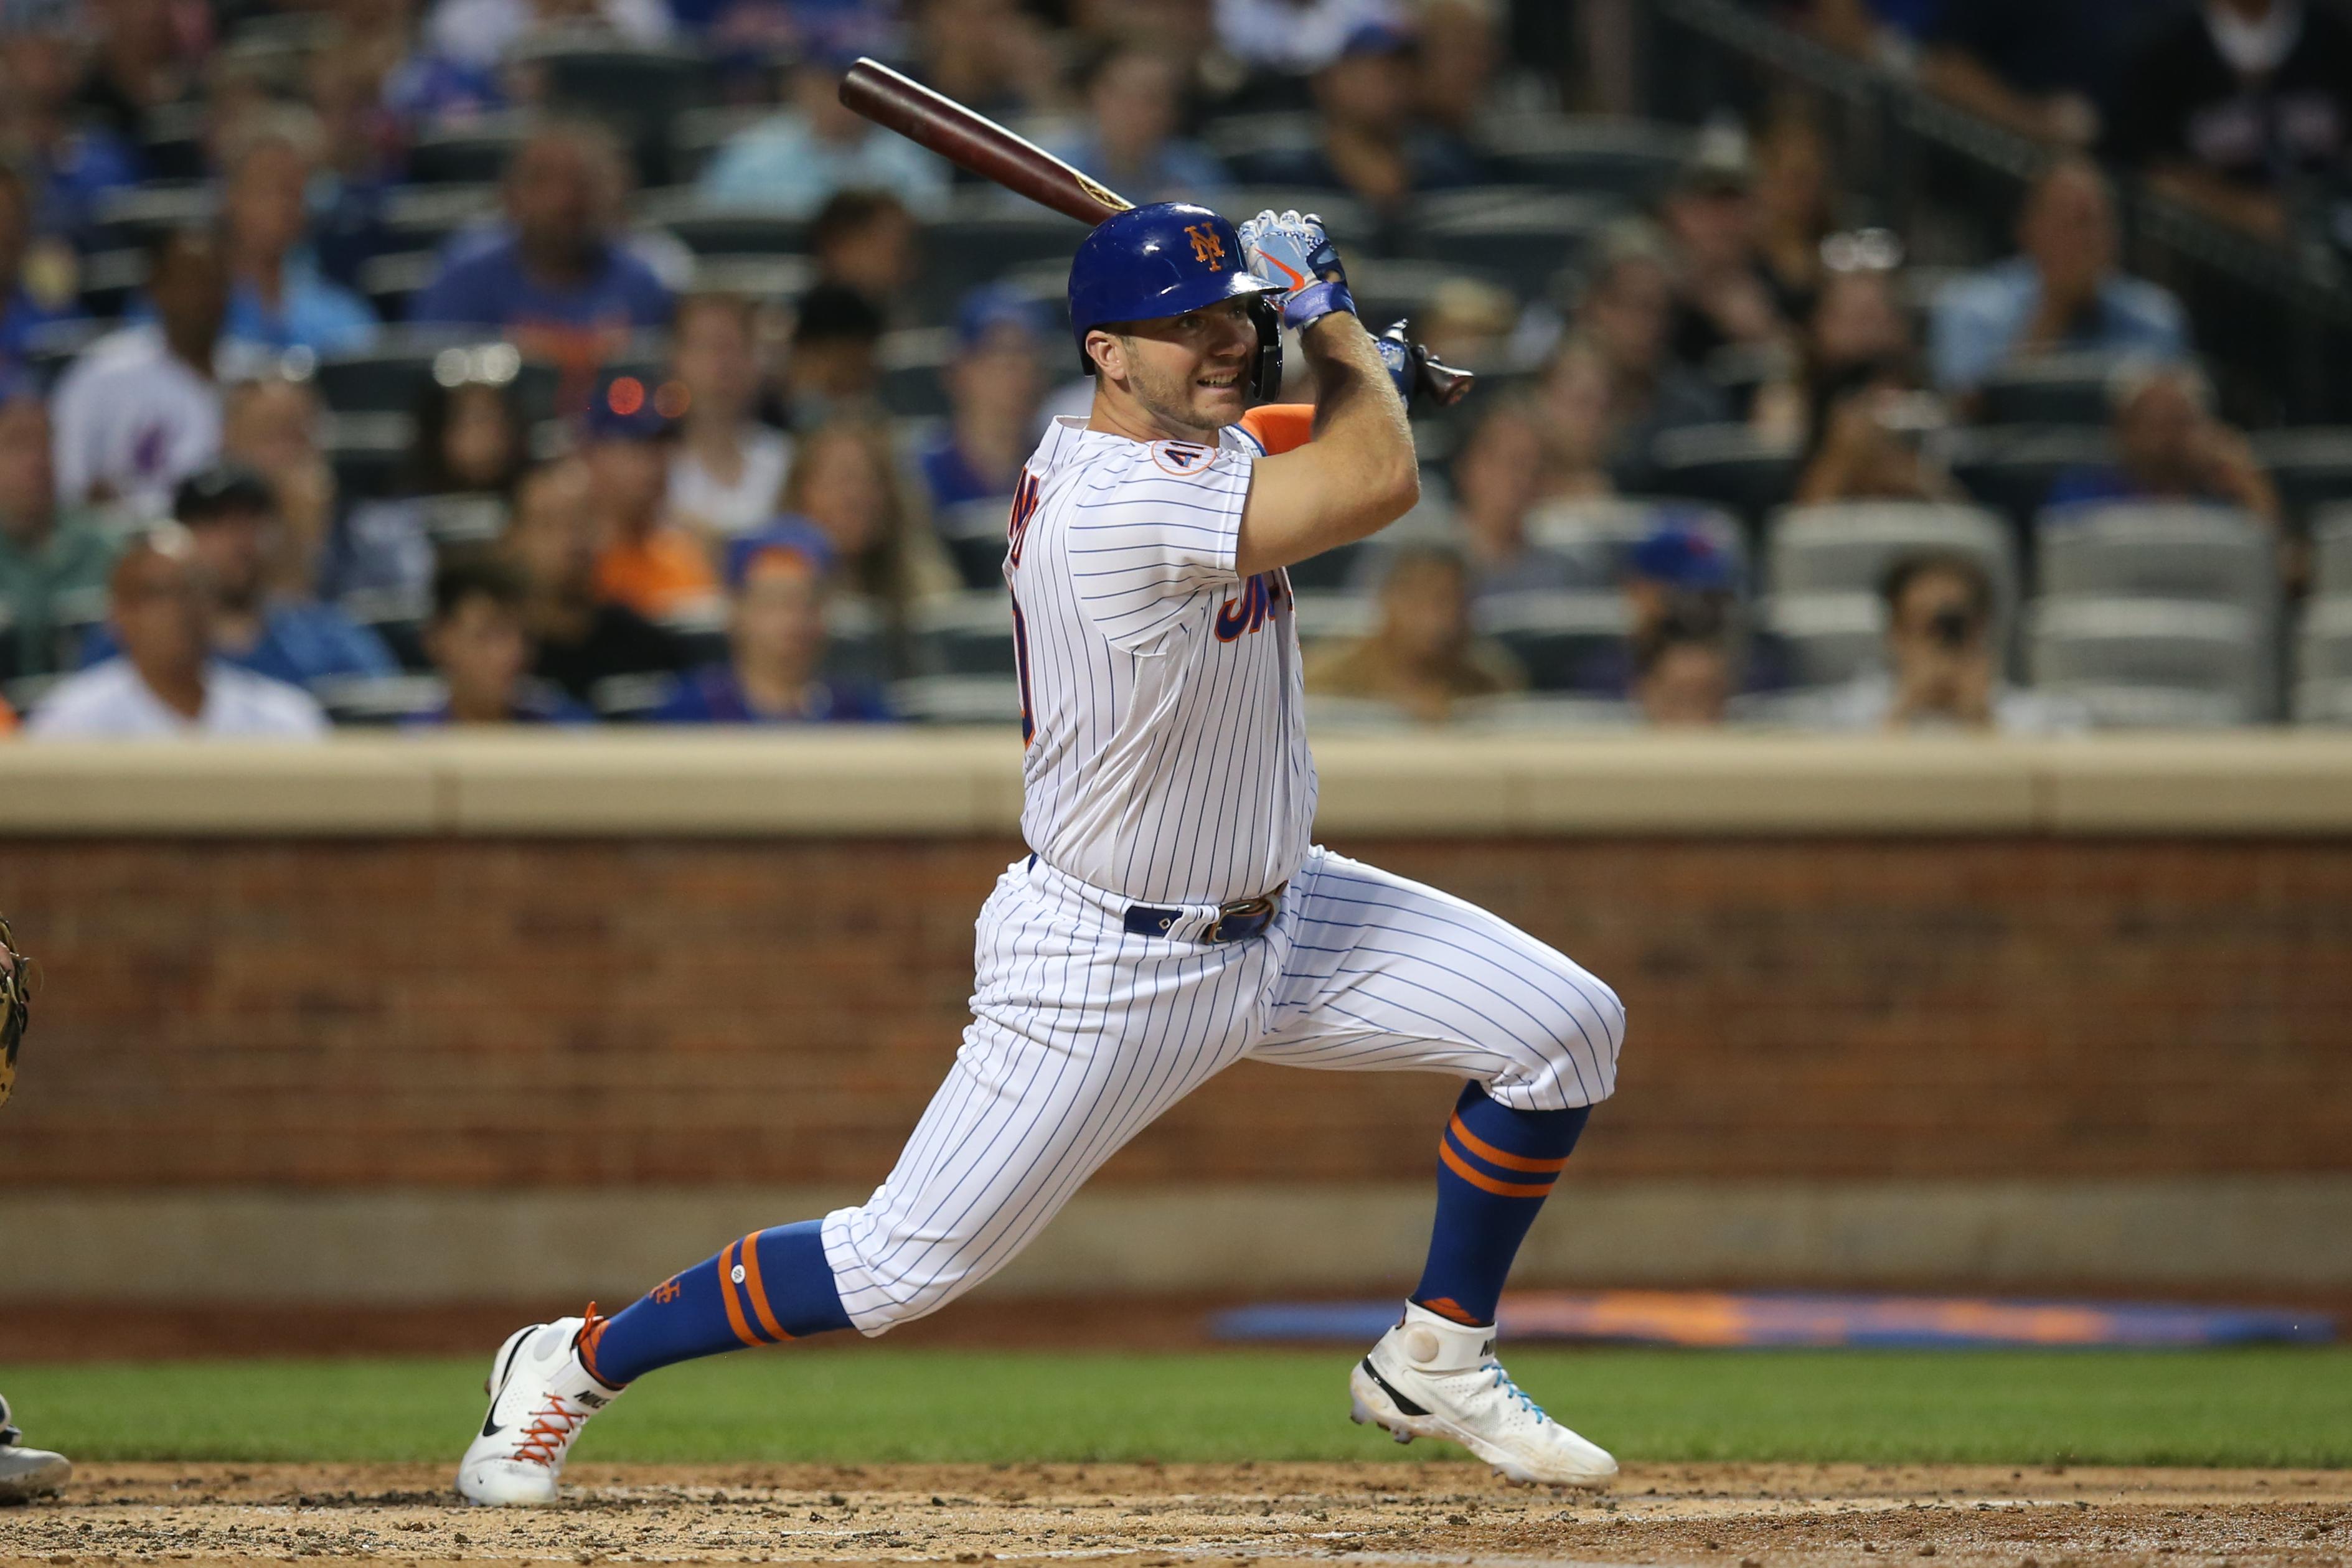 7/28/21 Game Preview: Atlanta Braves at New York Mets